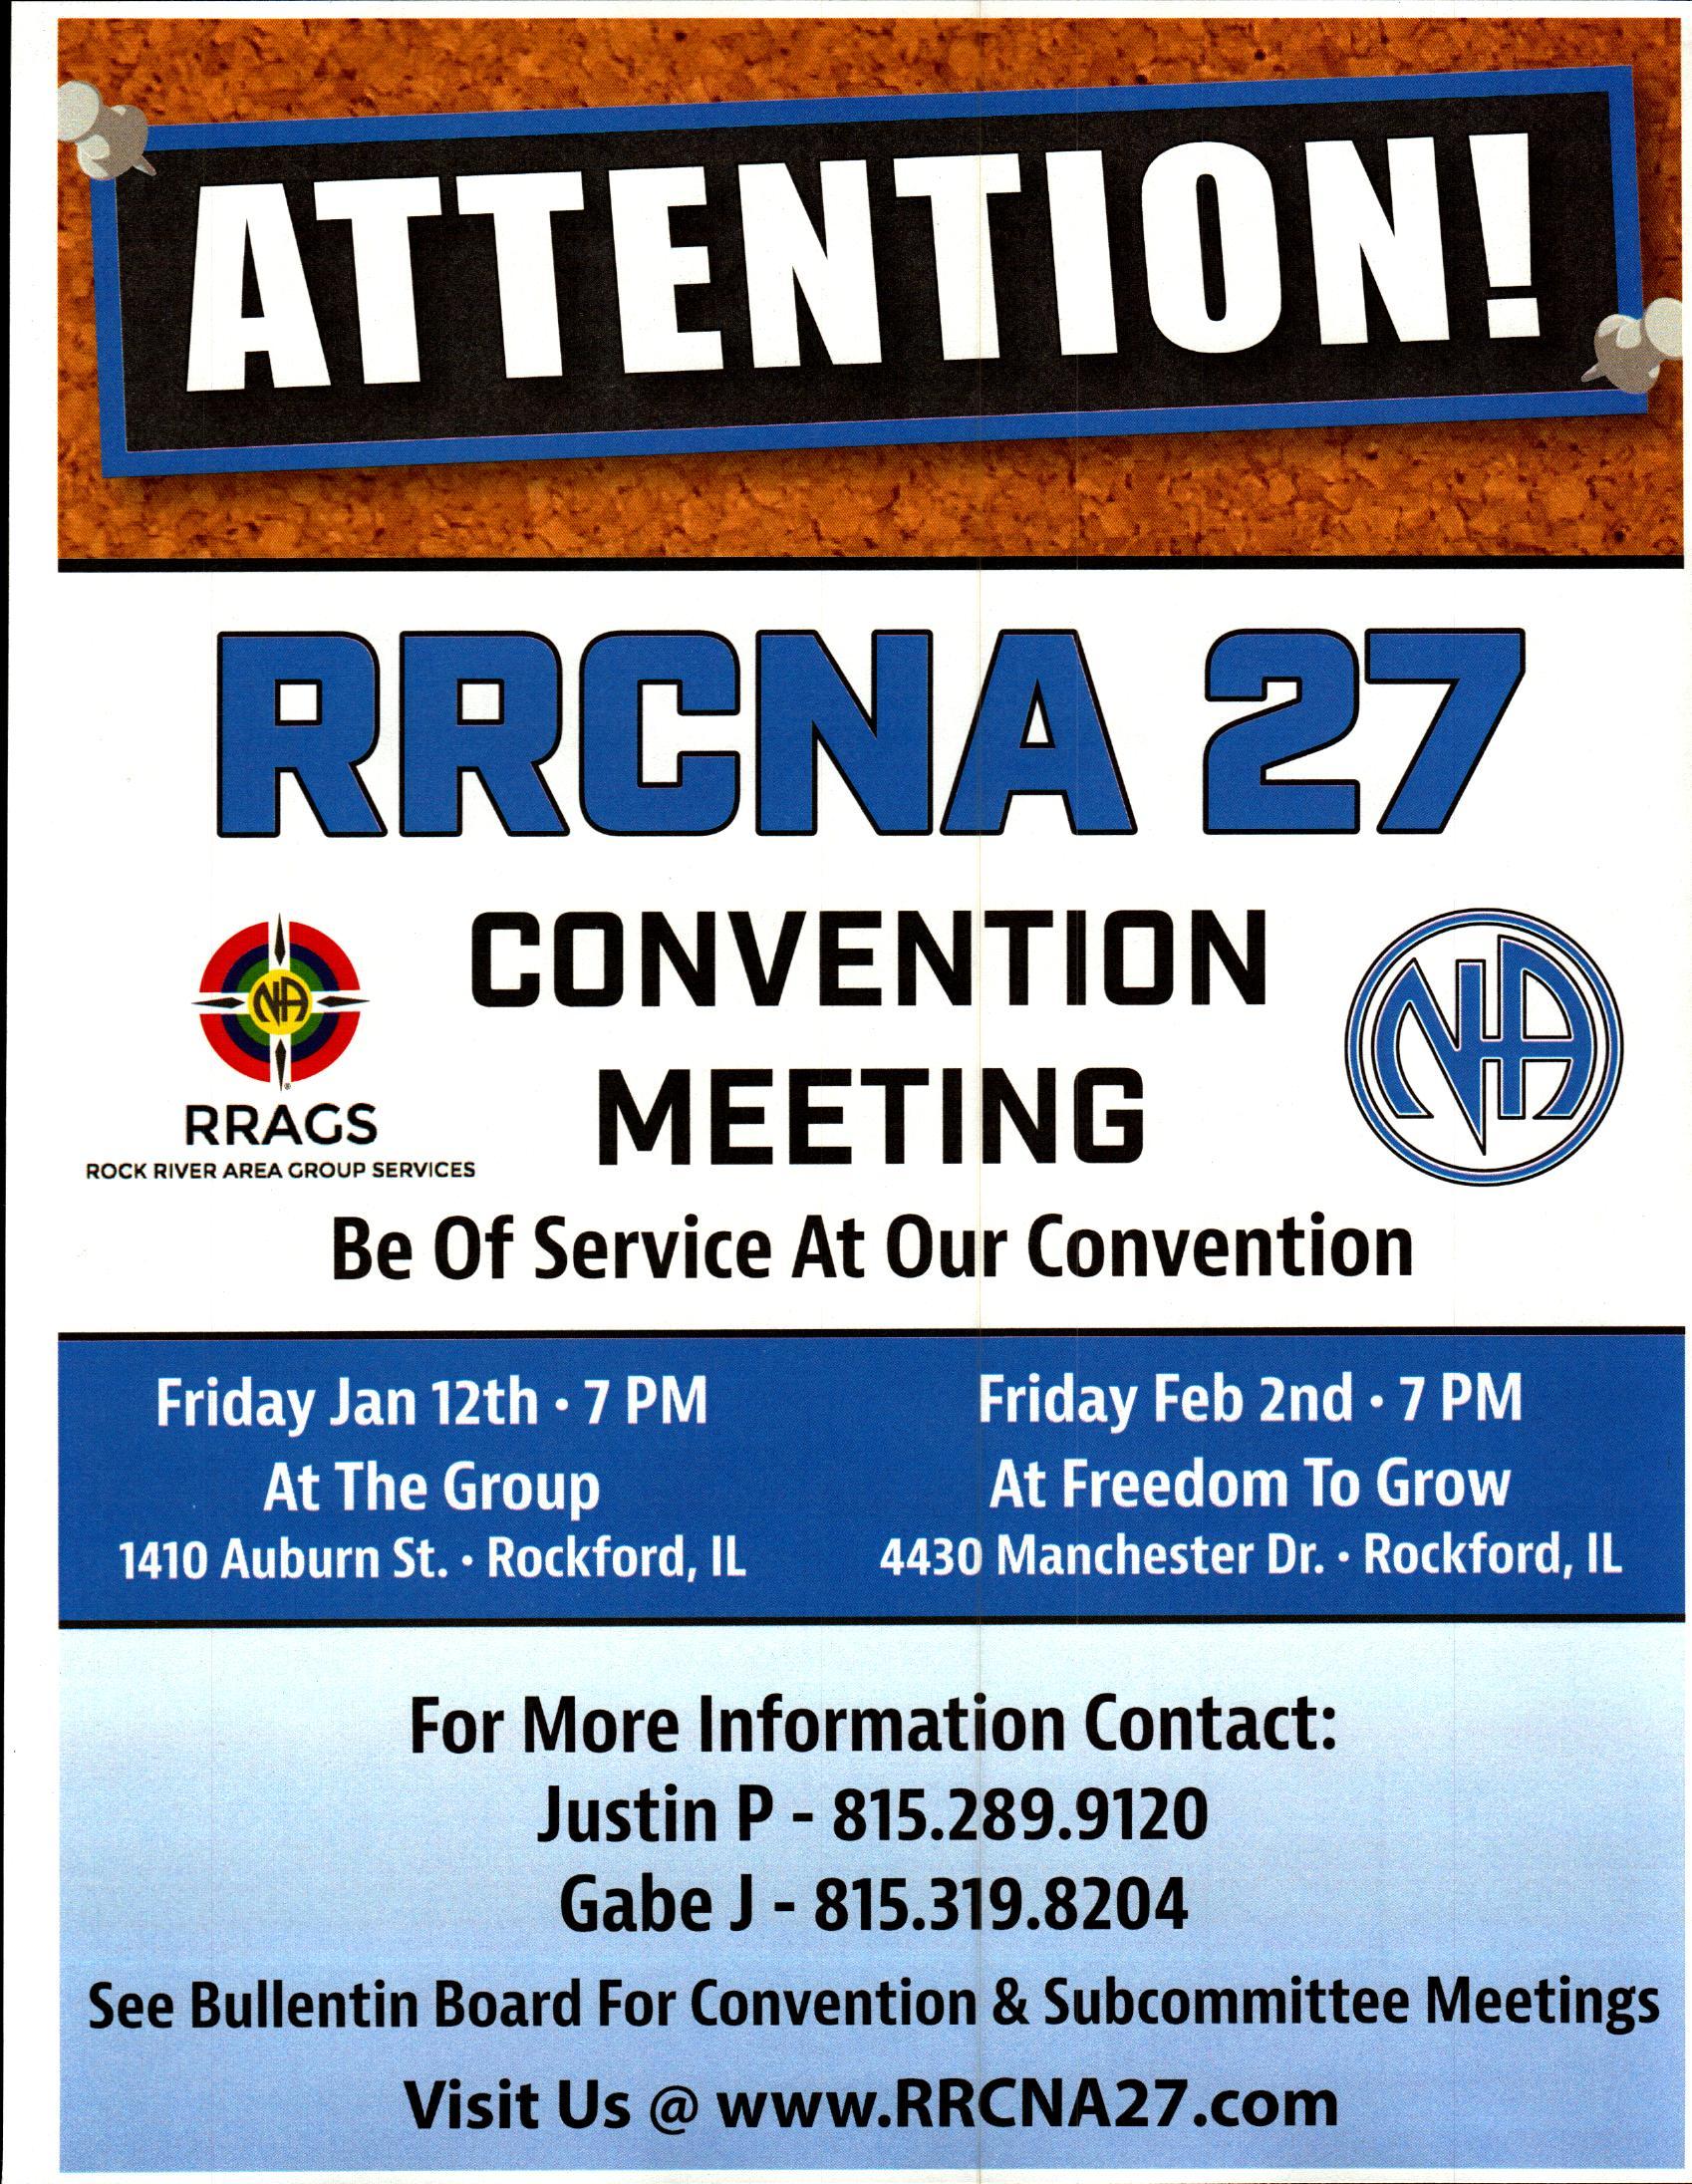 ConventionMeeting.jpg